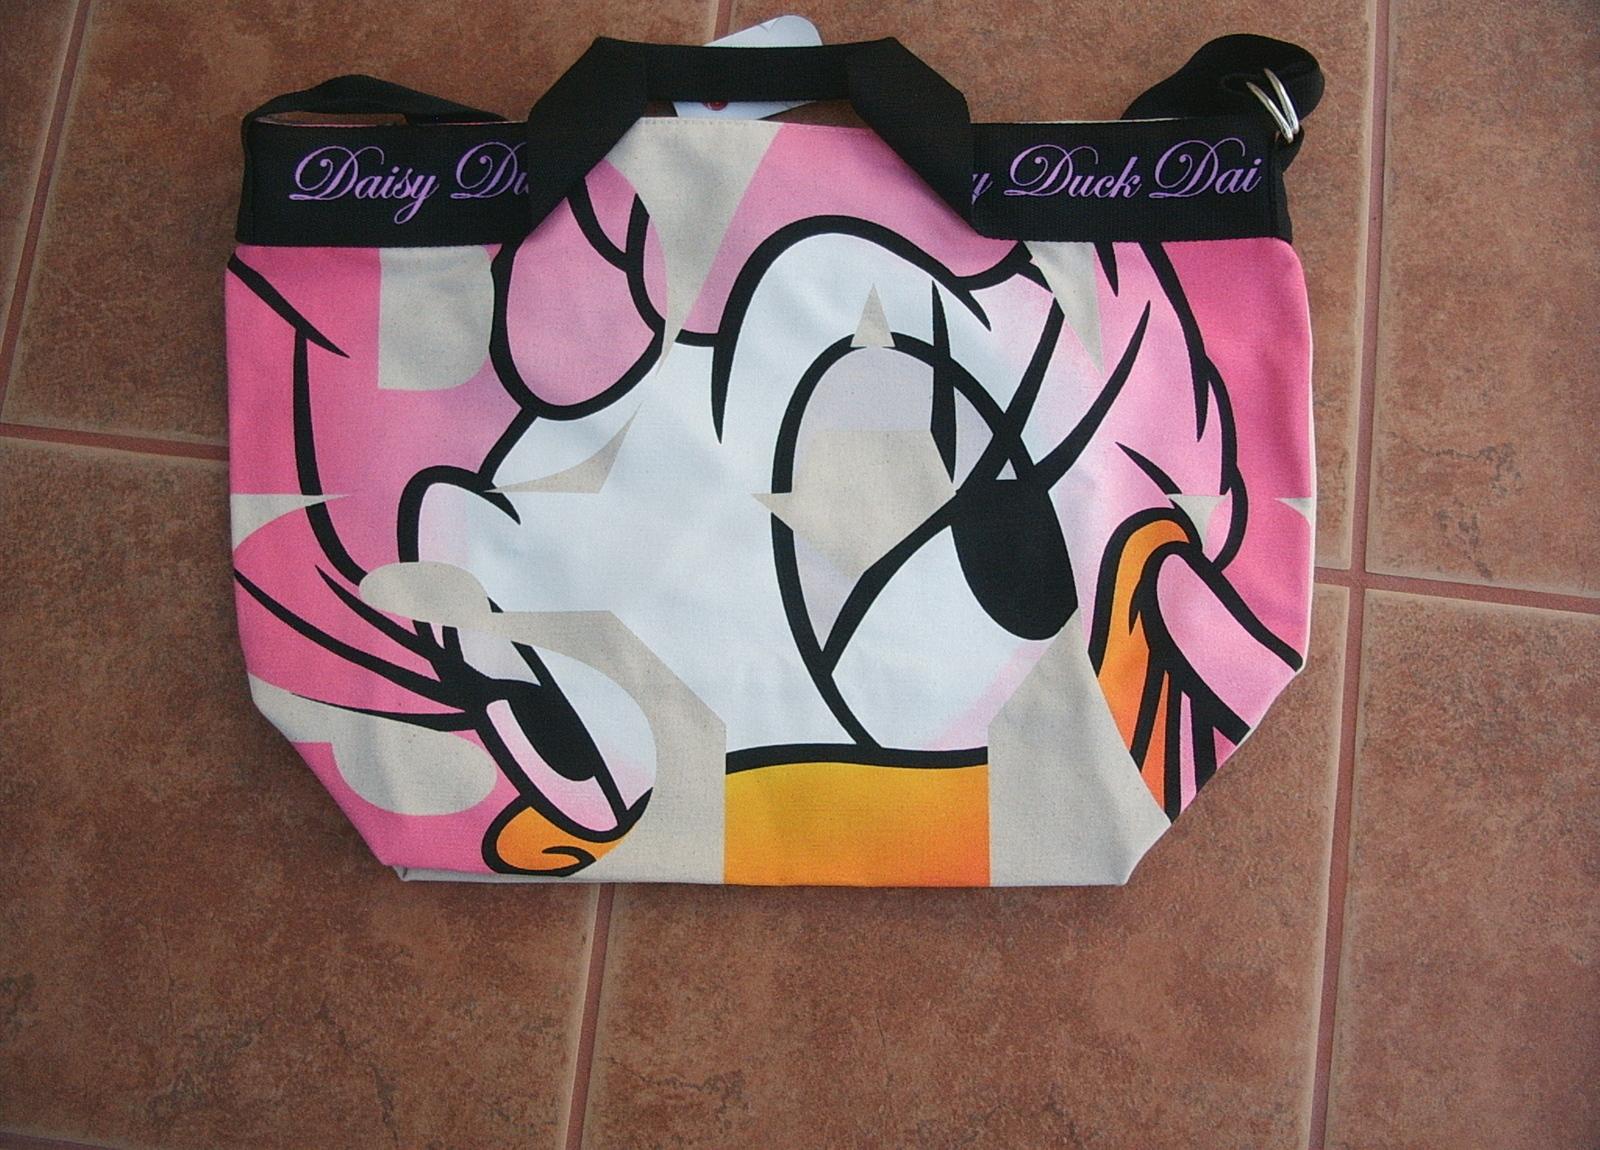 Nwtdisneydisney Japandaisy Duckcanvas And 50 Similar Items